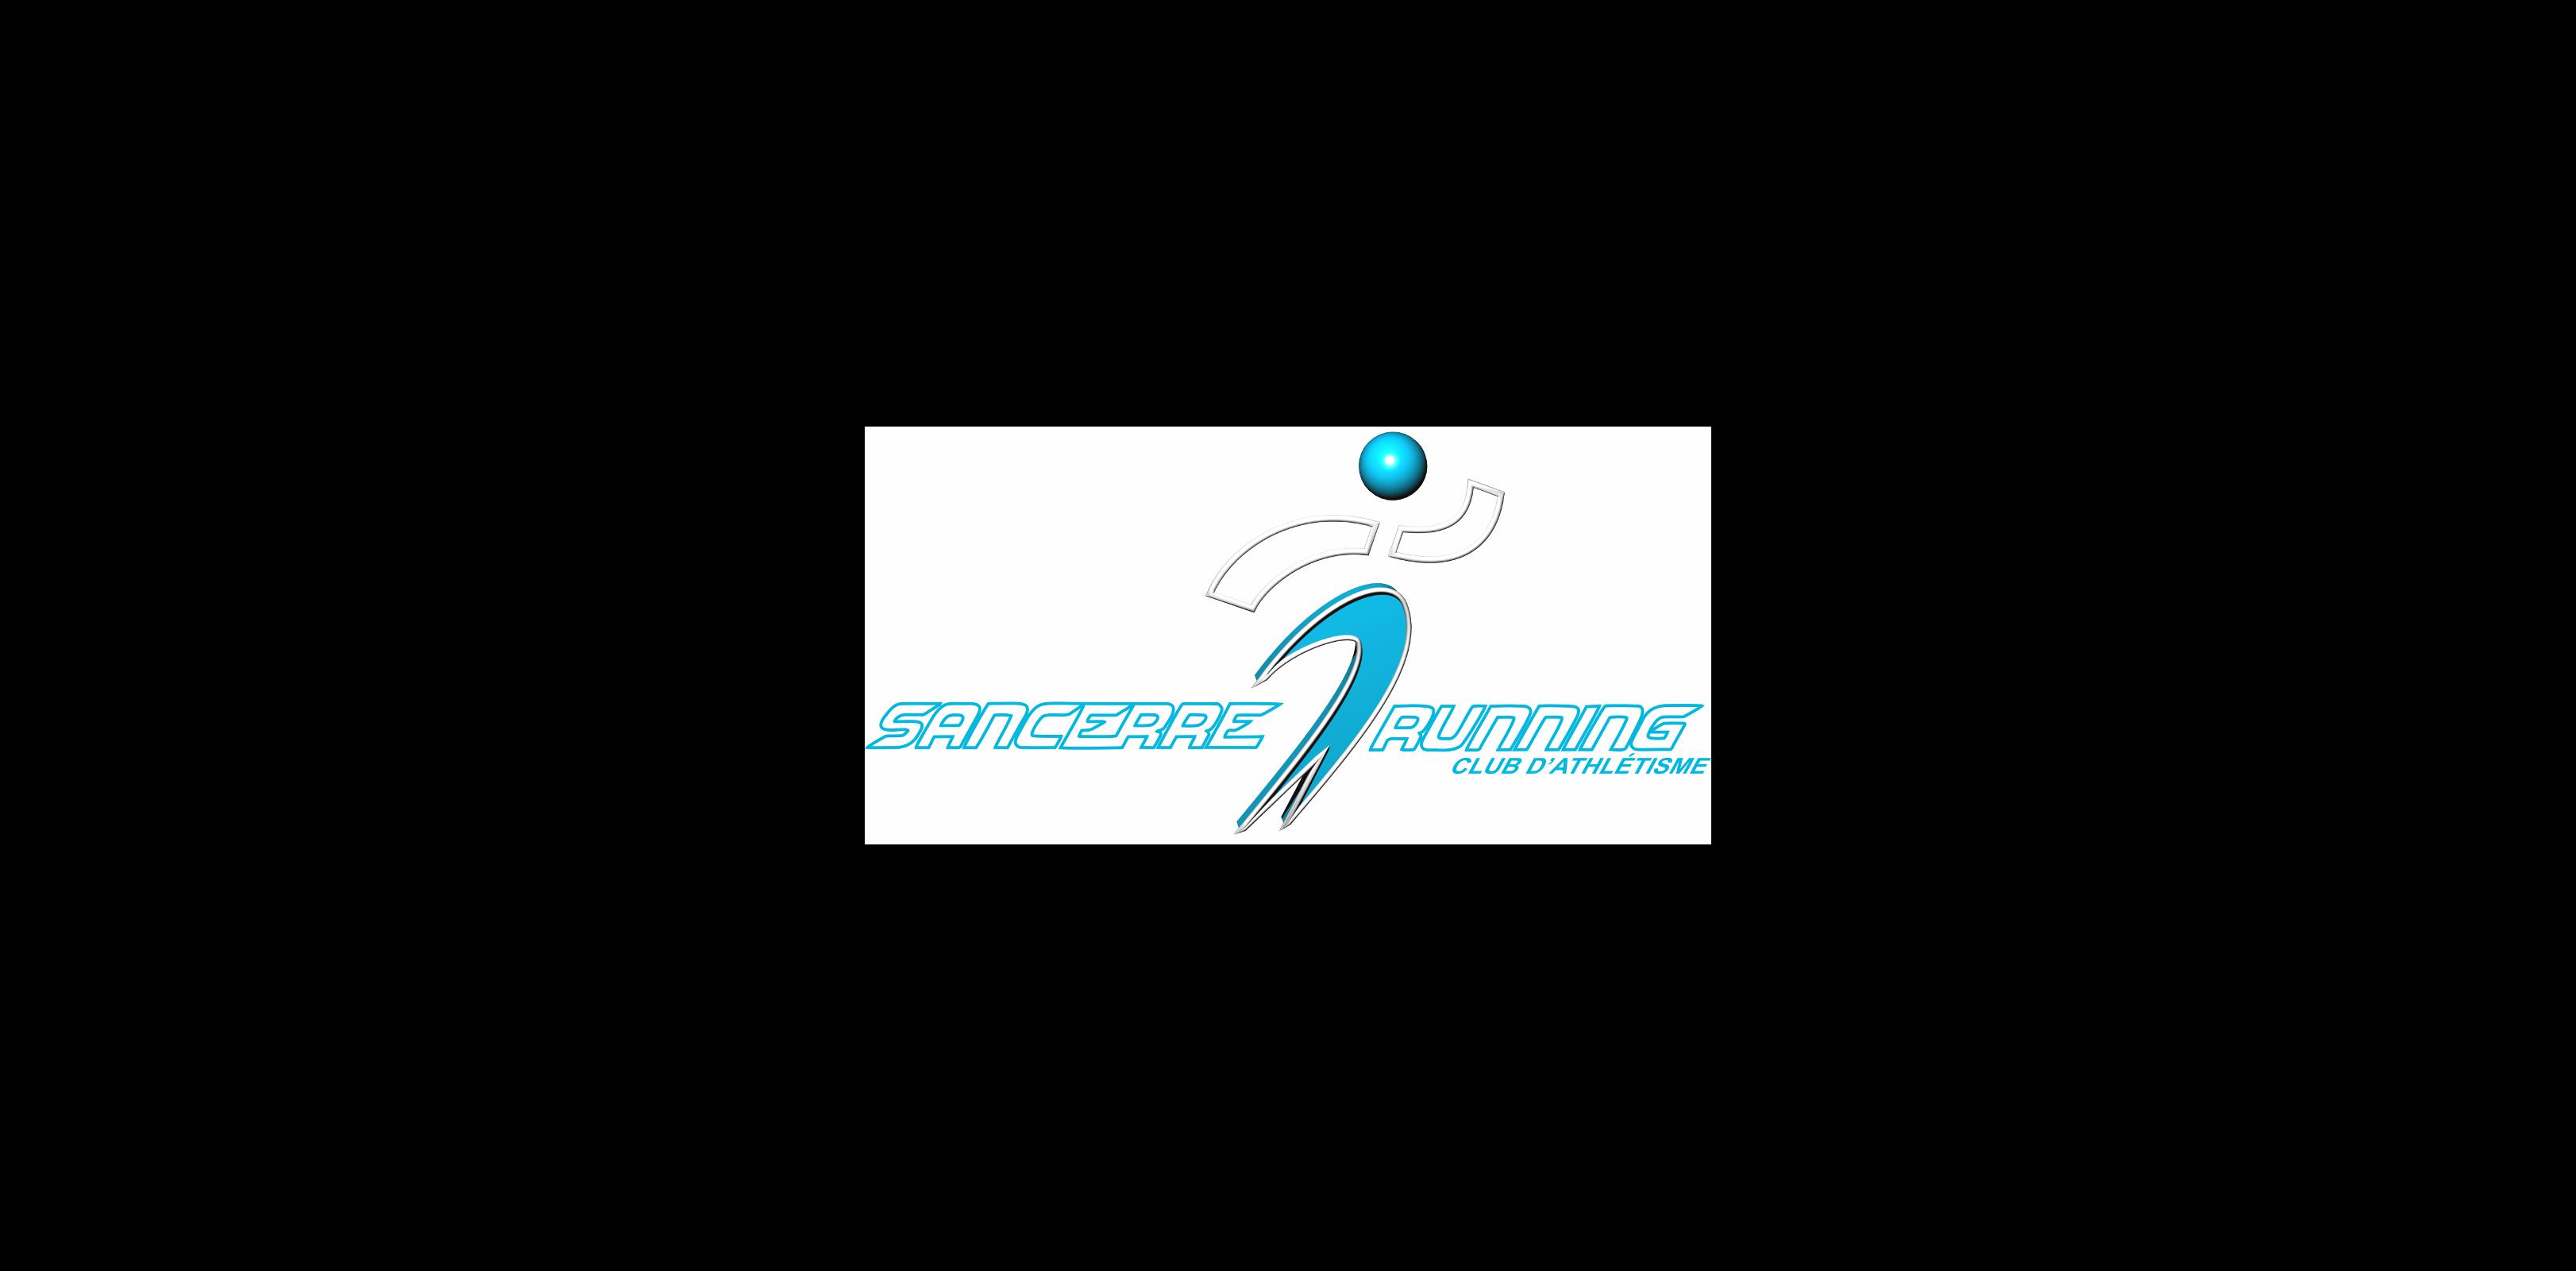 logo Sancerre (blanc)site.png